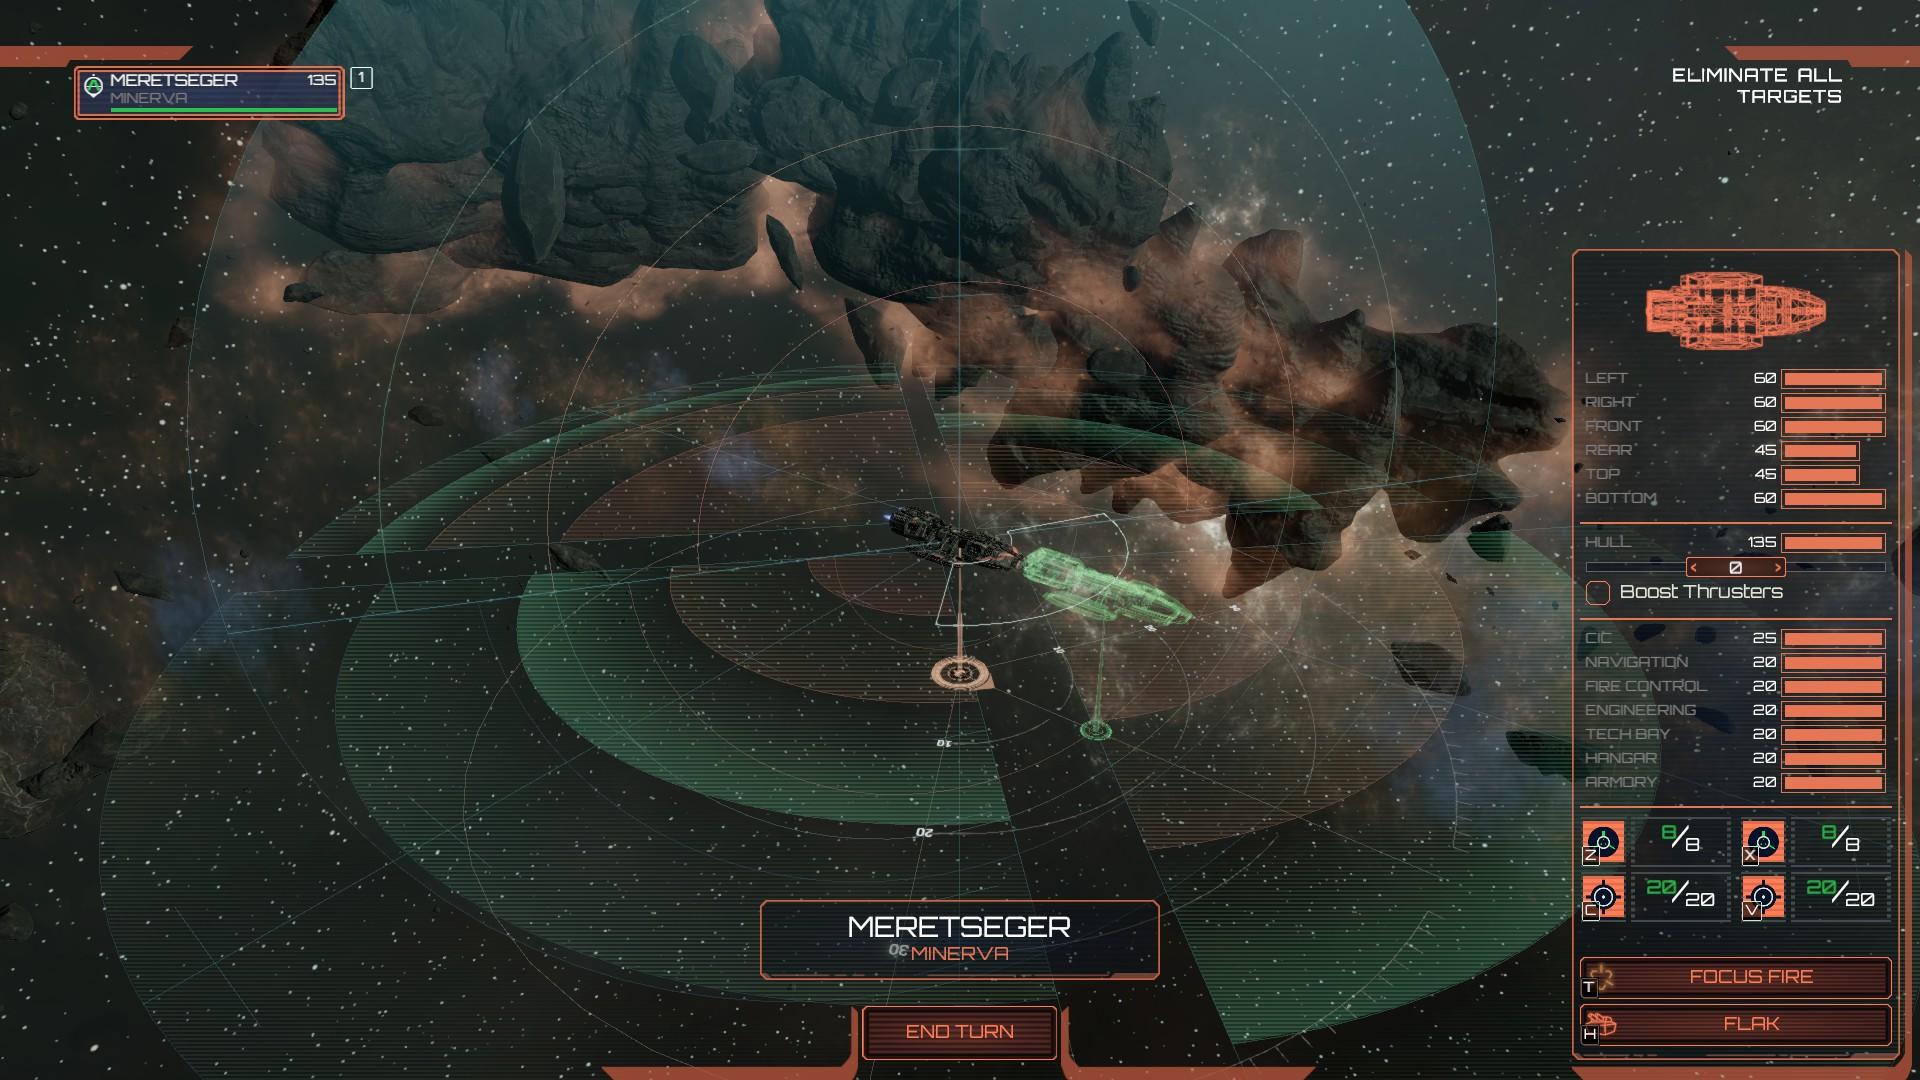 battlestar.galactica.deadlock.update.v1.0.5-codex